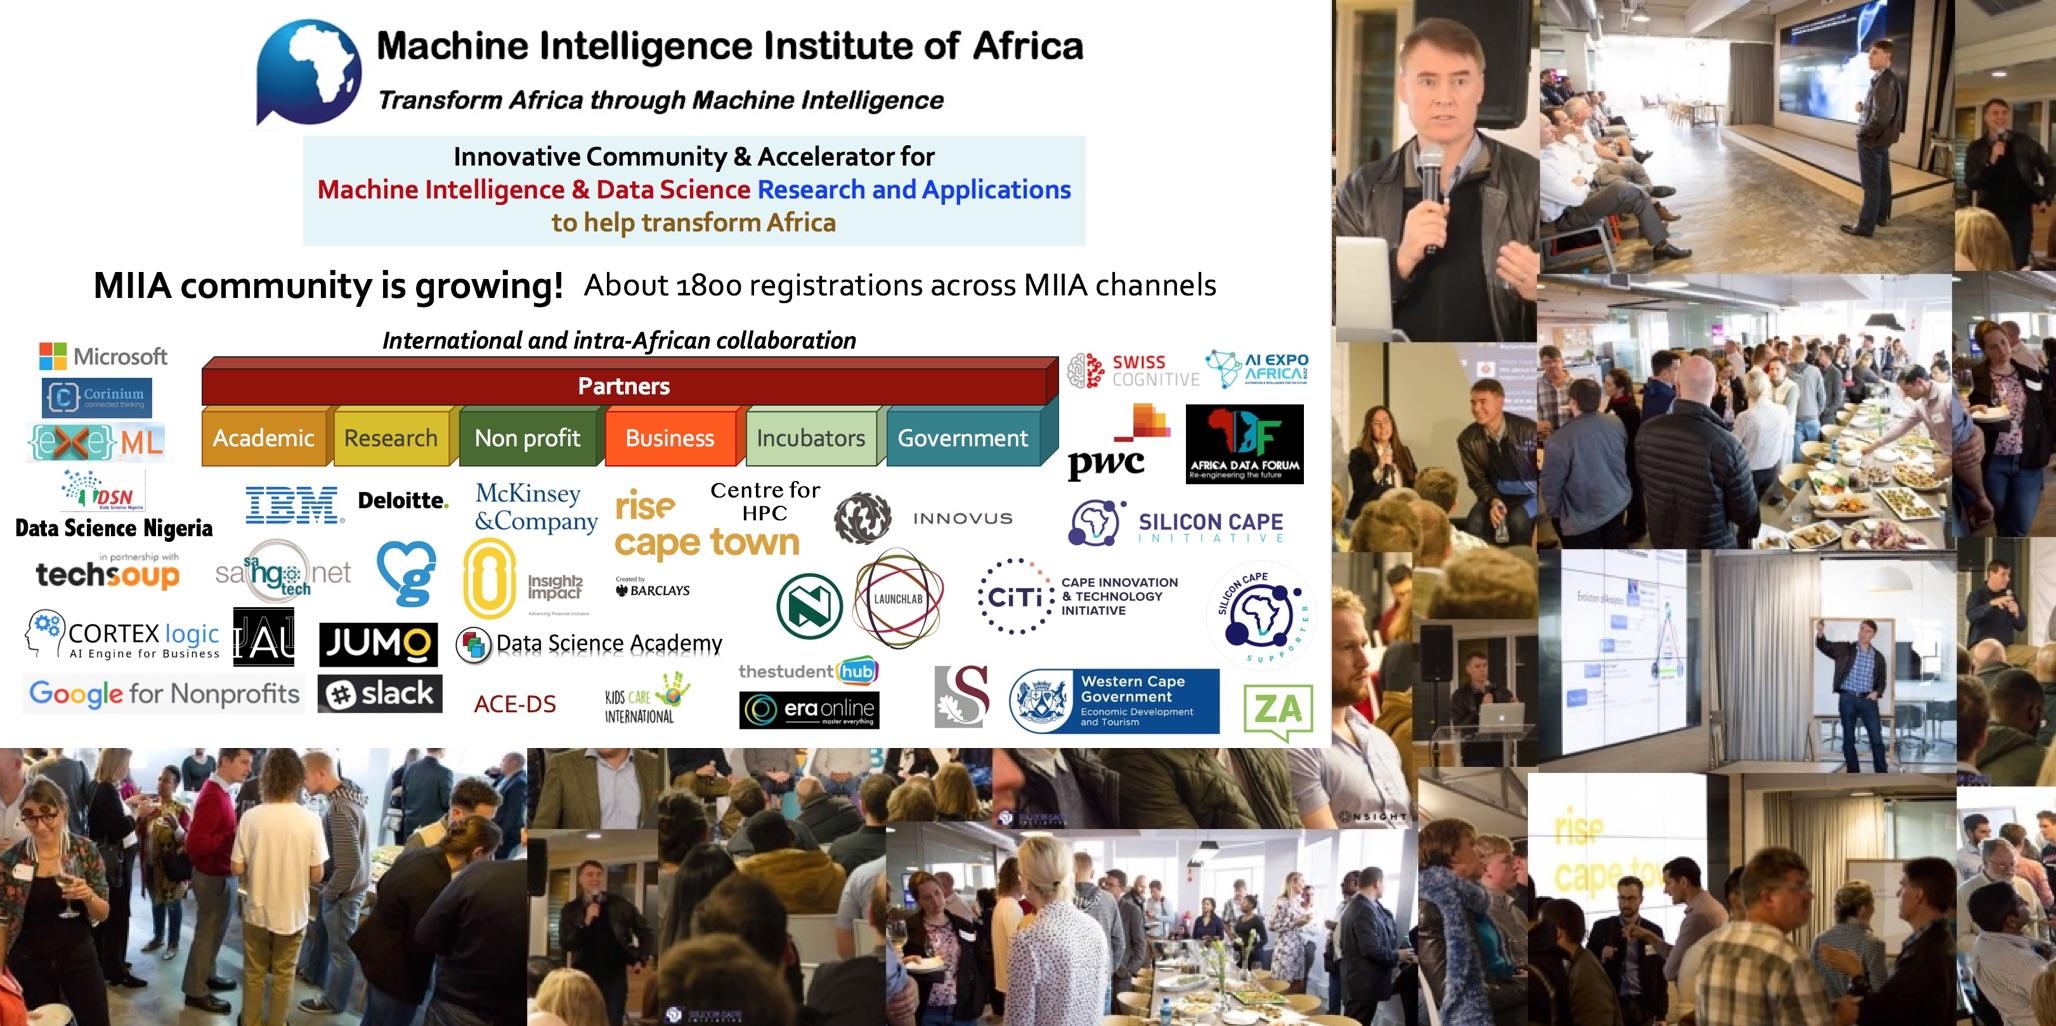 Machine Intelligence Institute of Africa 2018